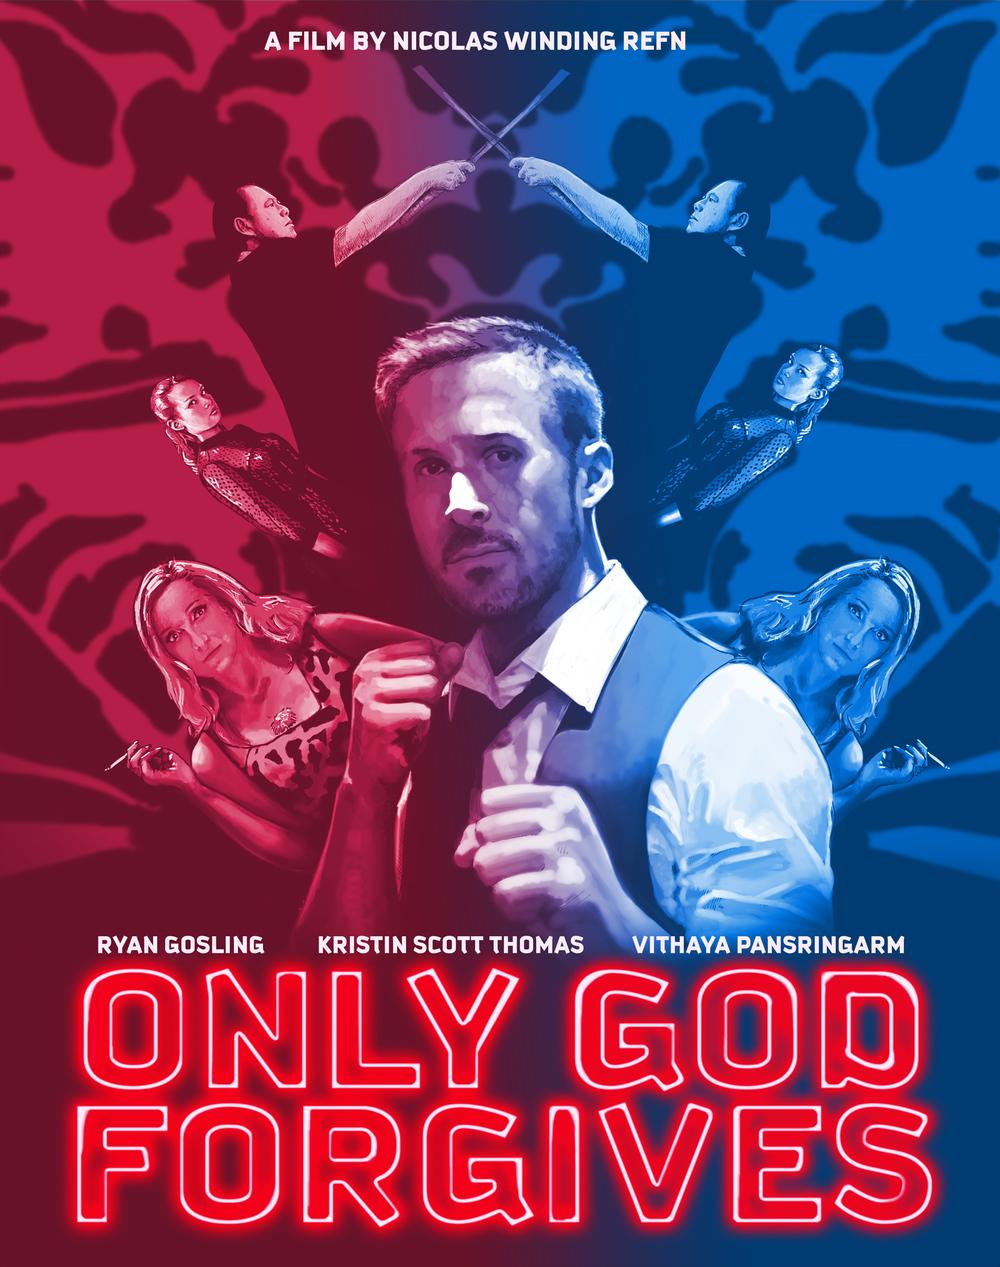 Only-God-Forgives10.jpg